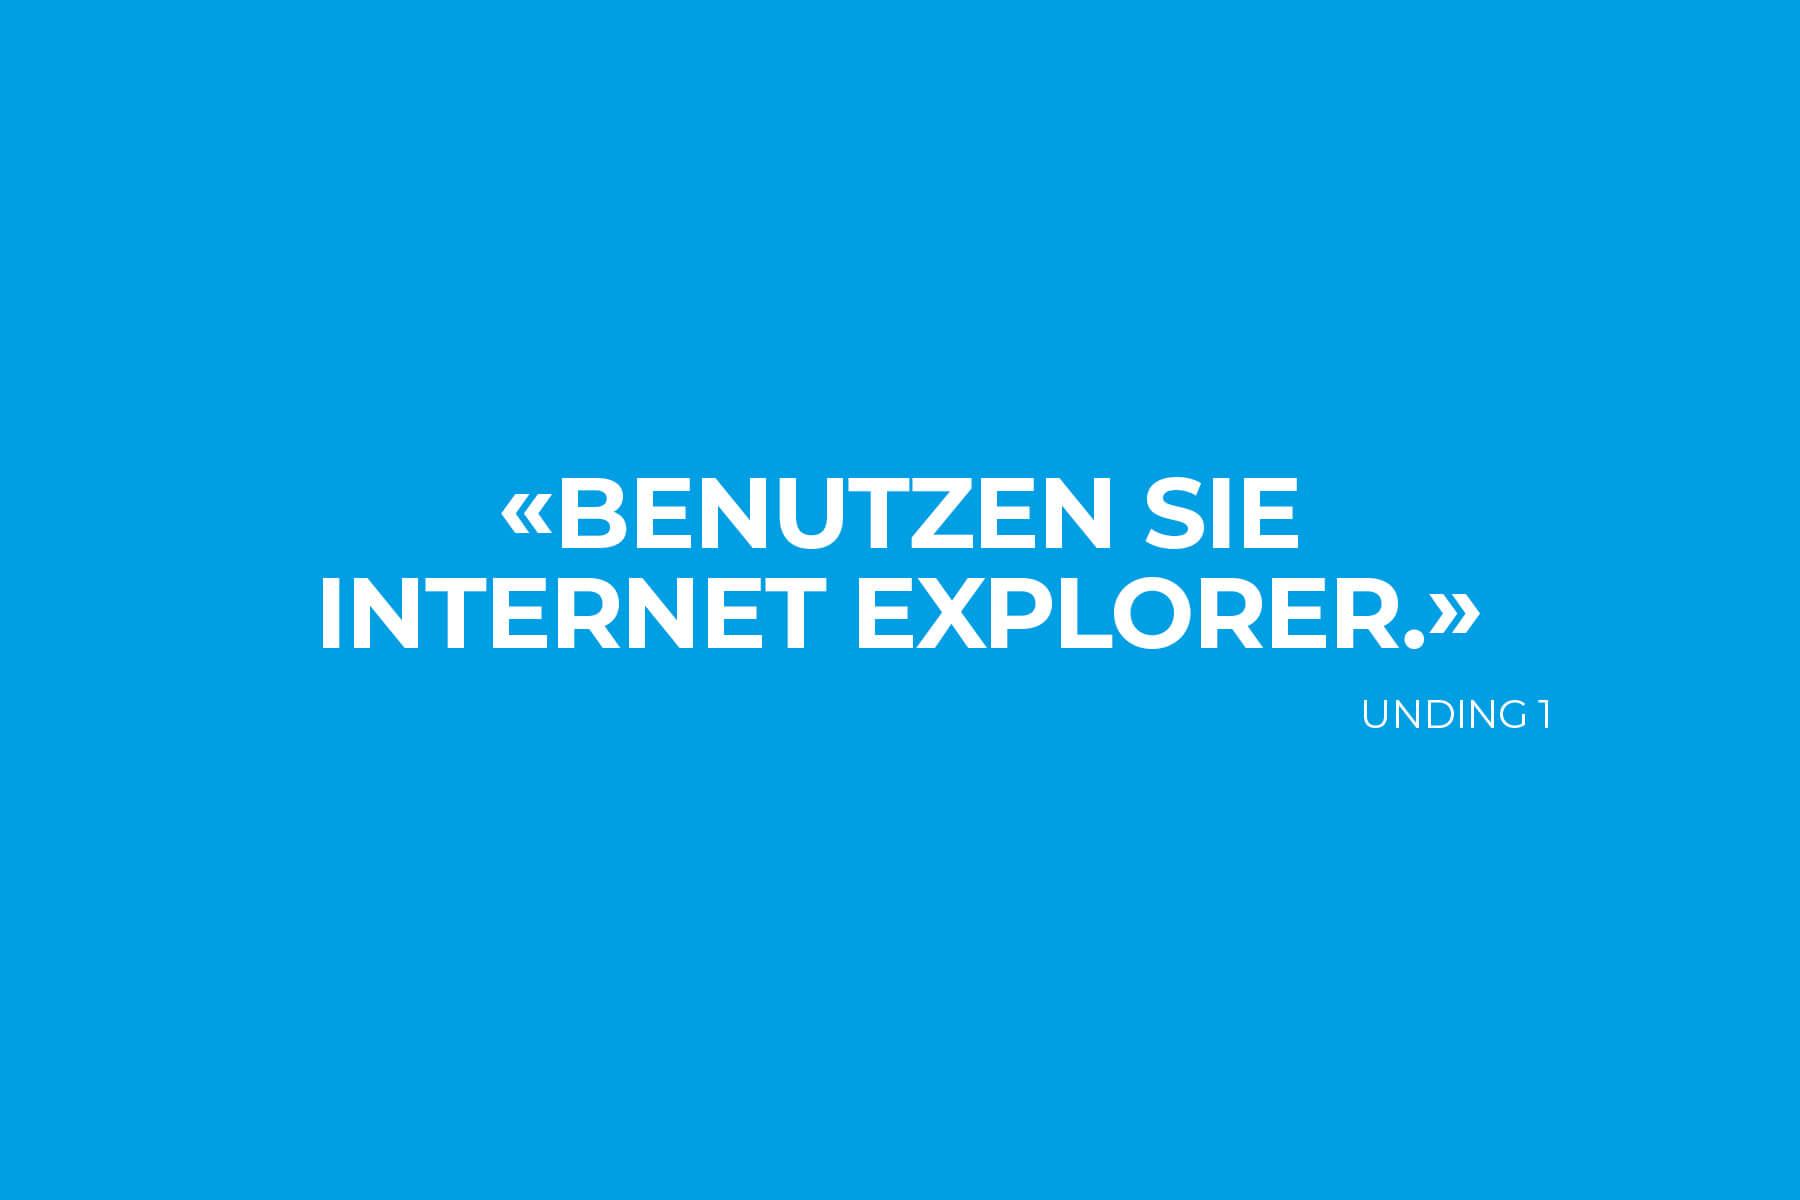 cc_1_unding-internet-explorer